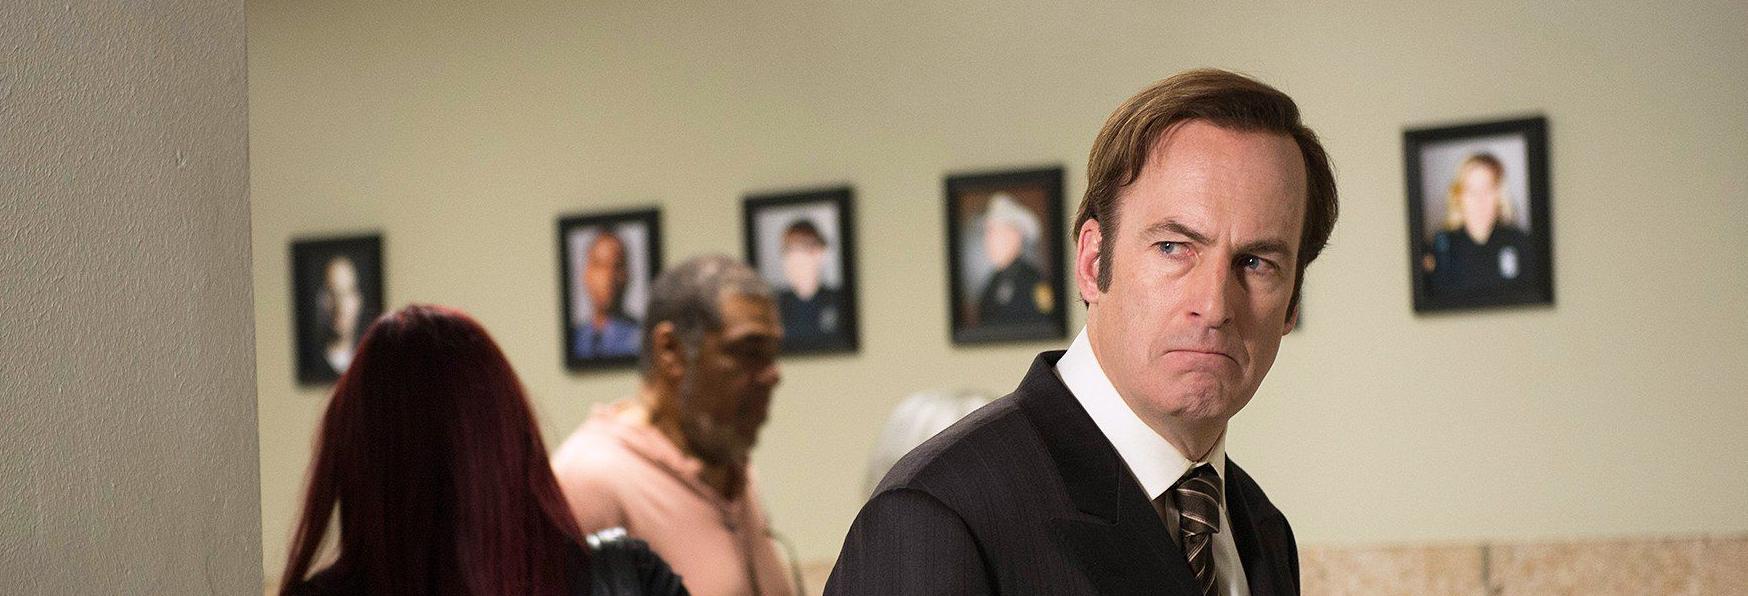 Better Call Saul 5: nel nuovo Teaser Trailer vediamo Jimmy nei panni di Saul Goodman